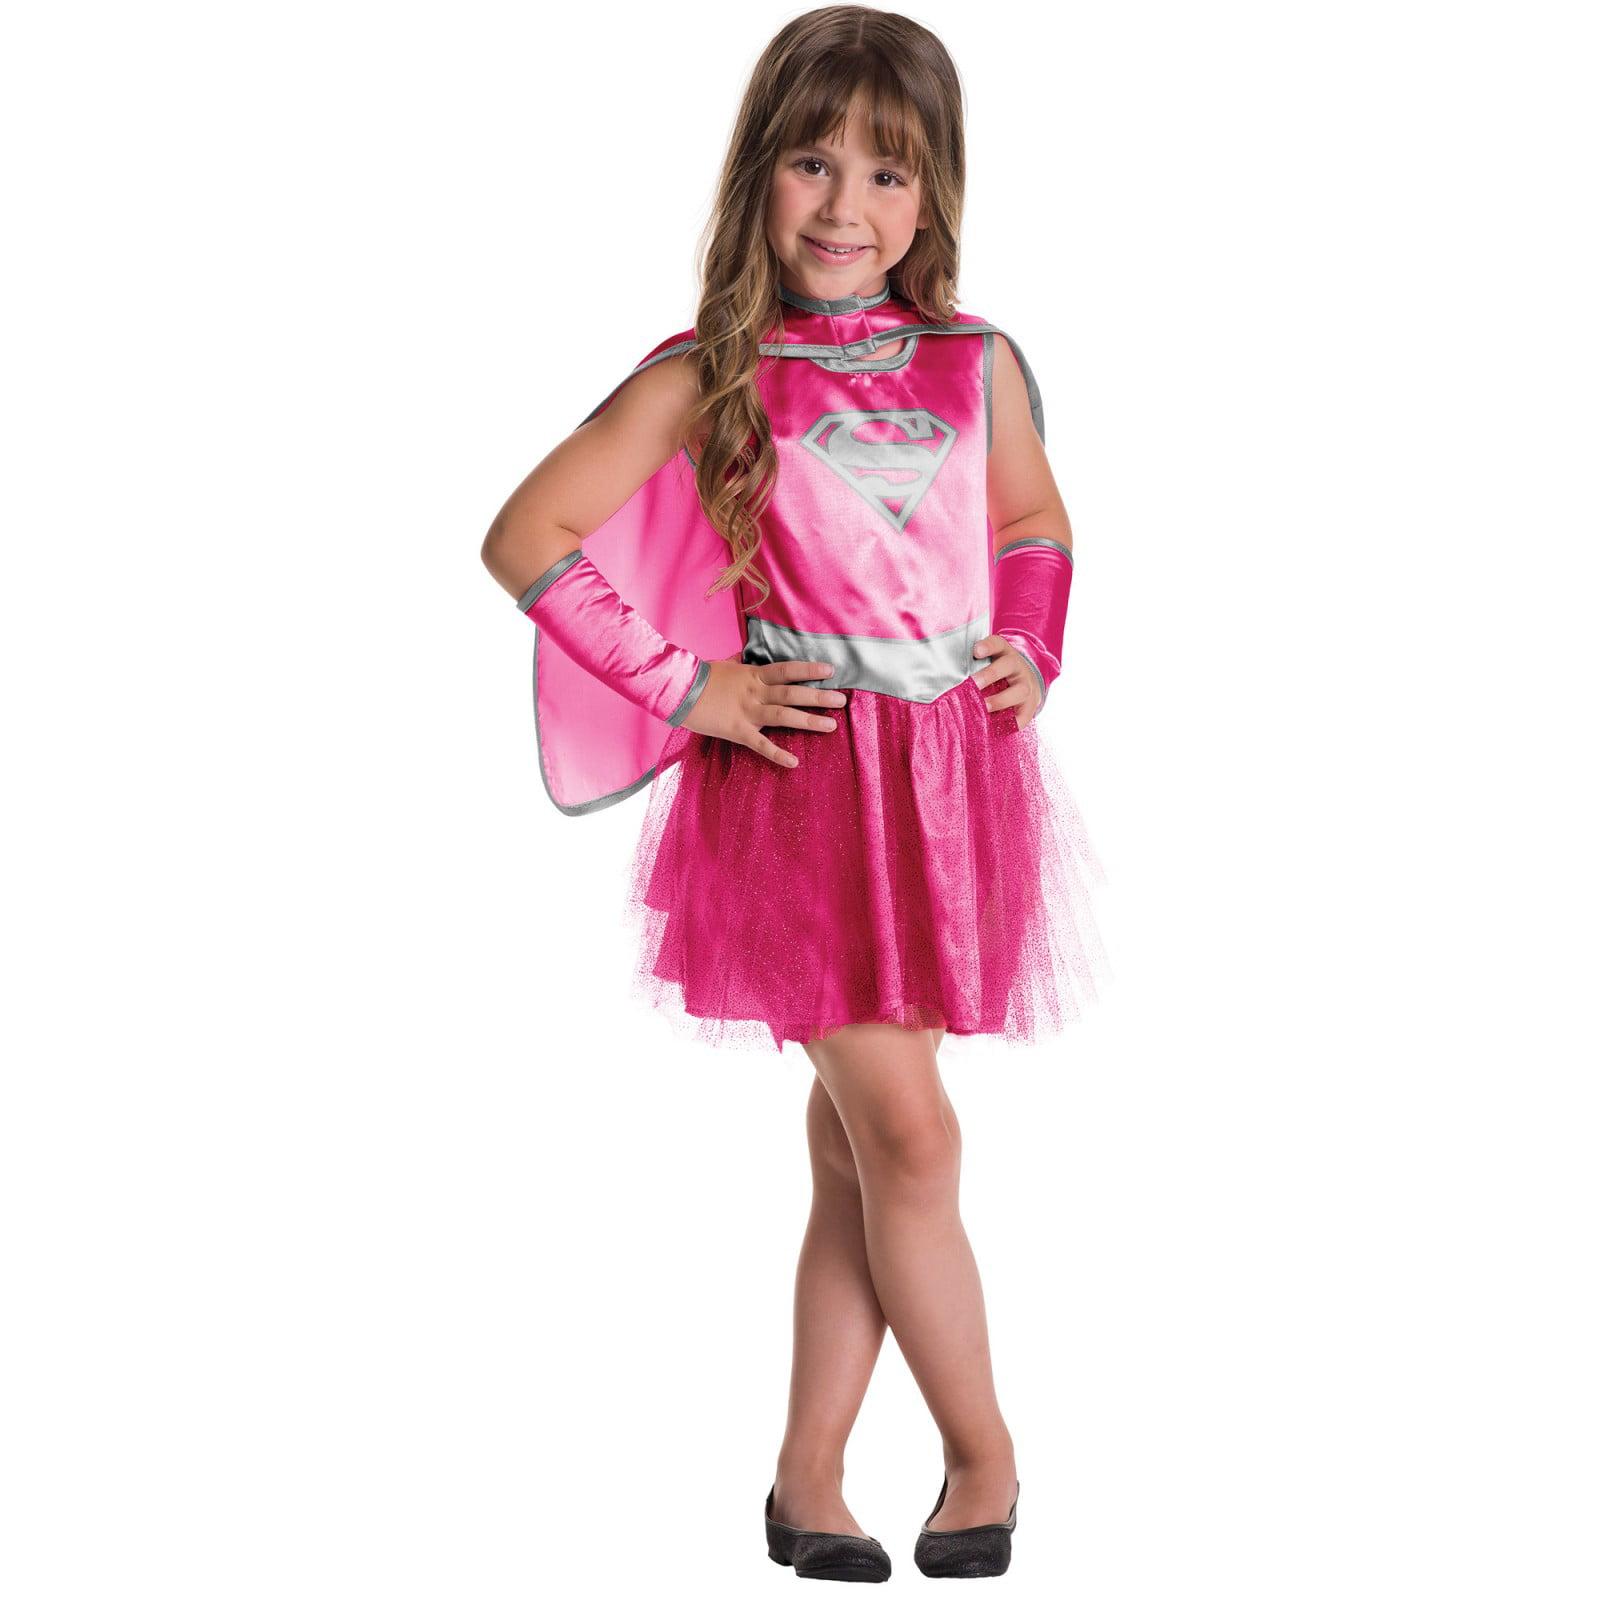 Supergirl Dress and Cape Set